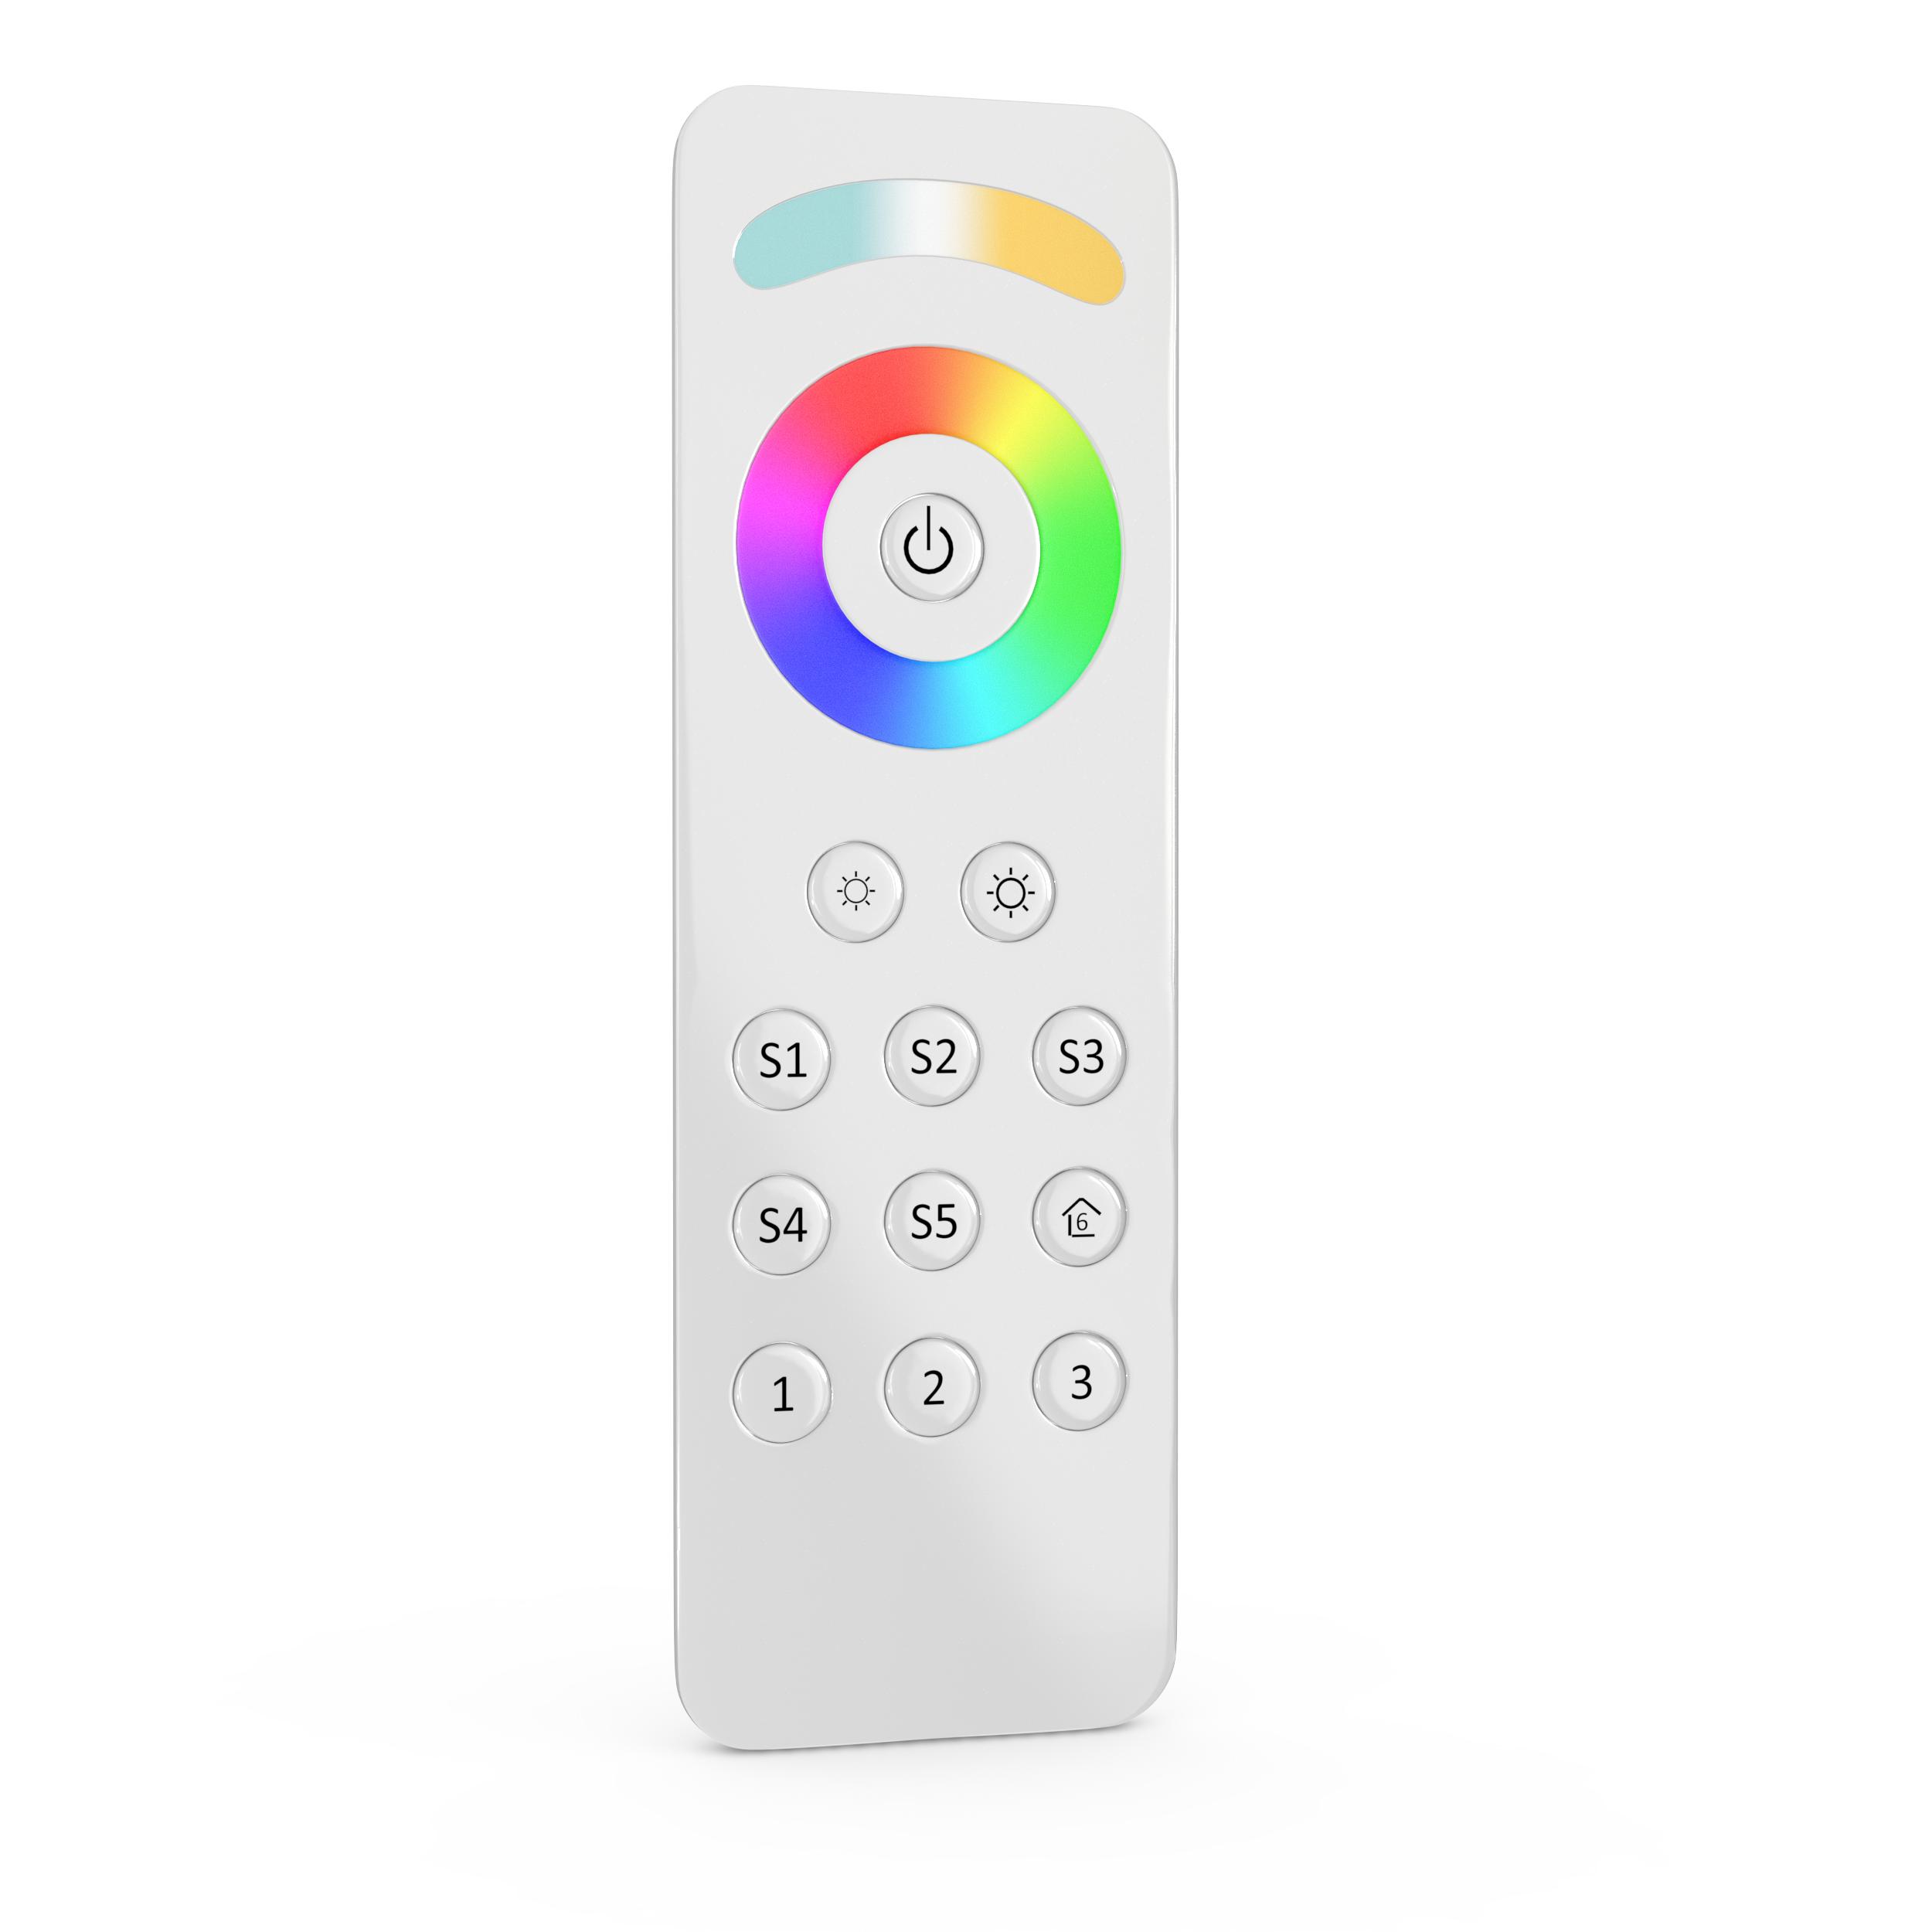 RGB-RGBW multizone ZigBee LED remote controller